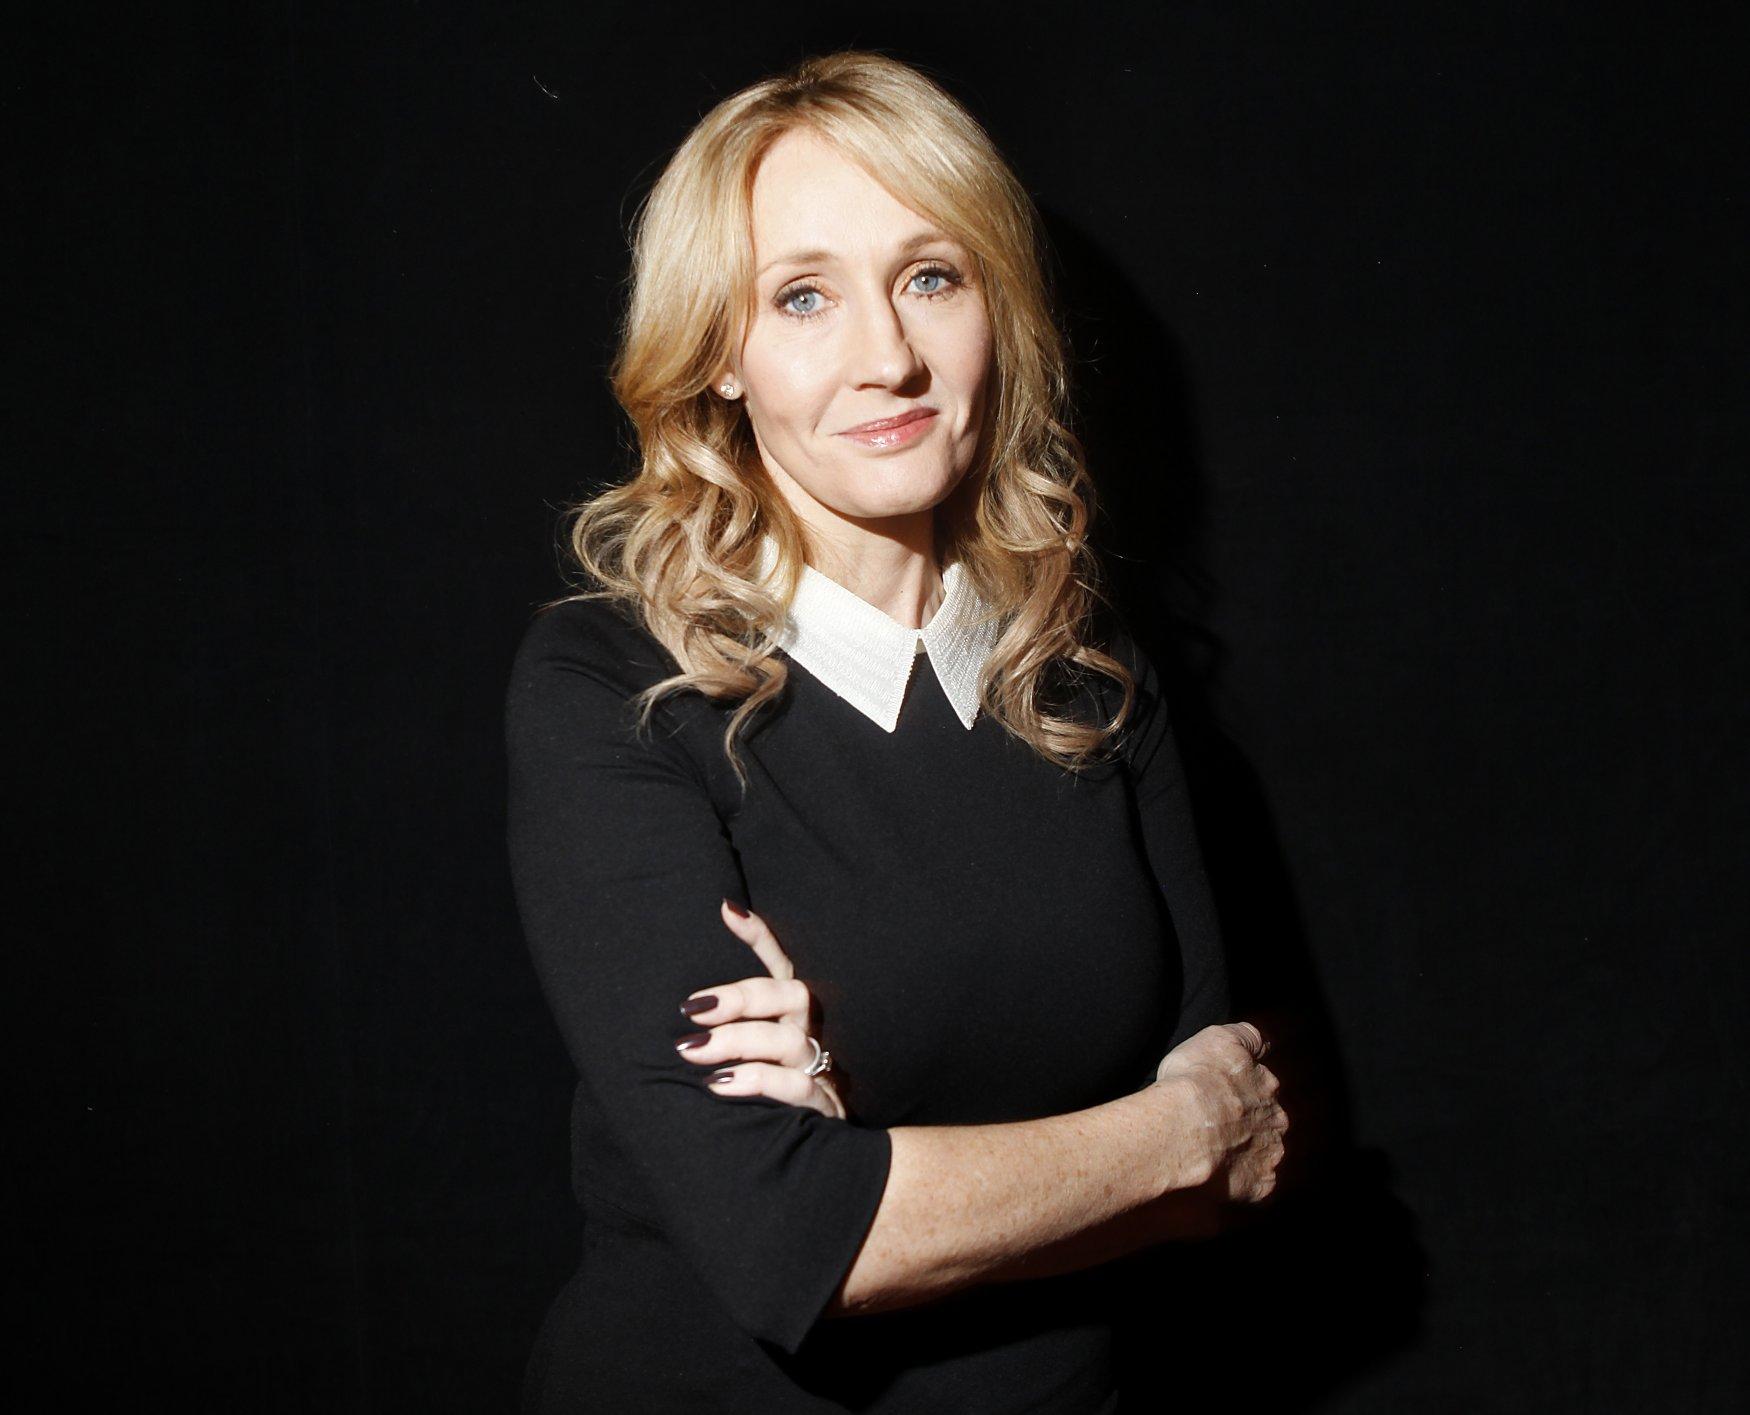 J.K. Rowling Writing